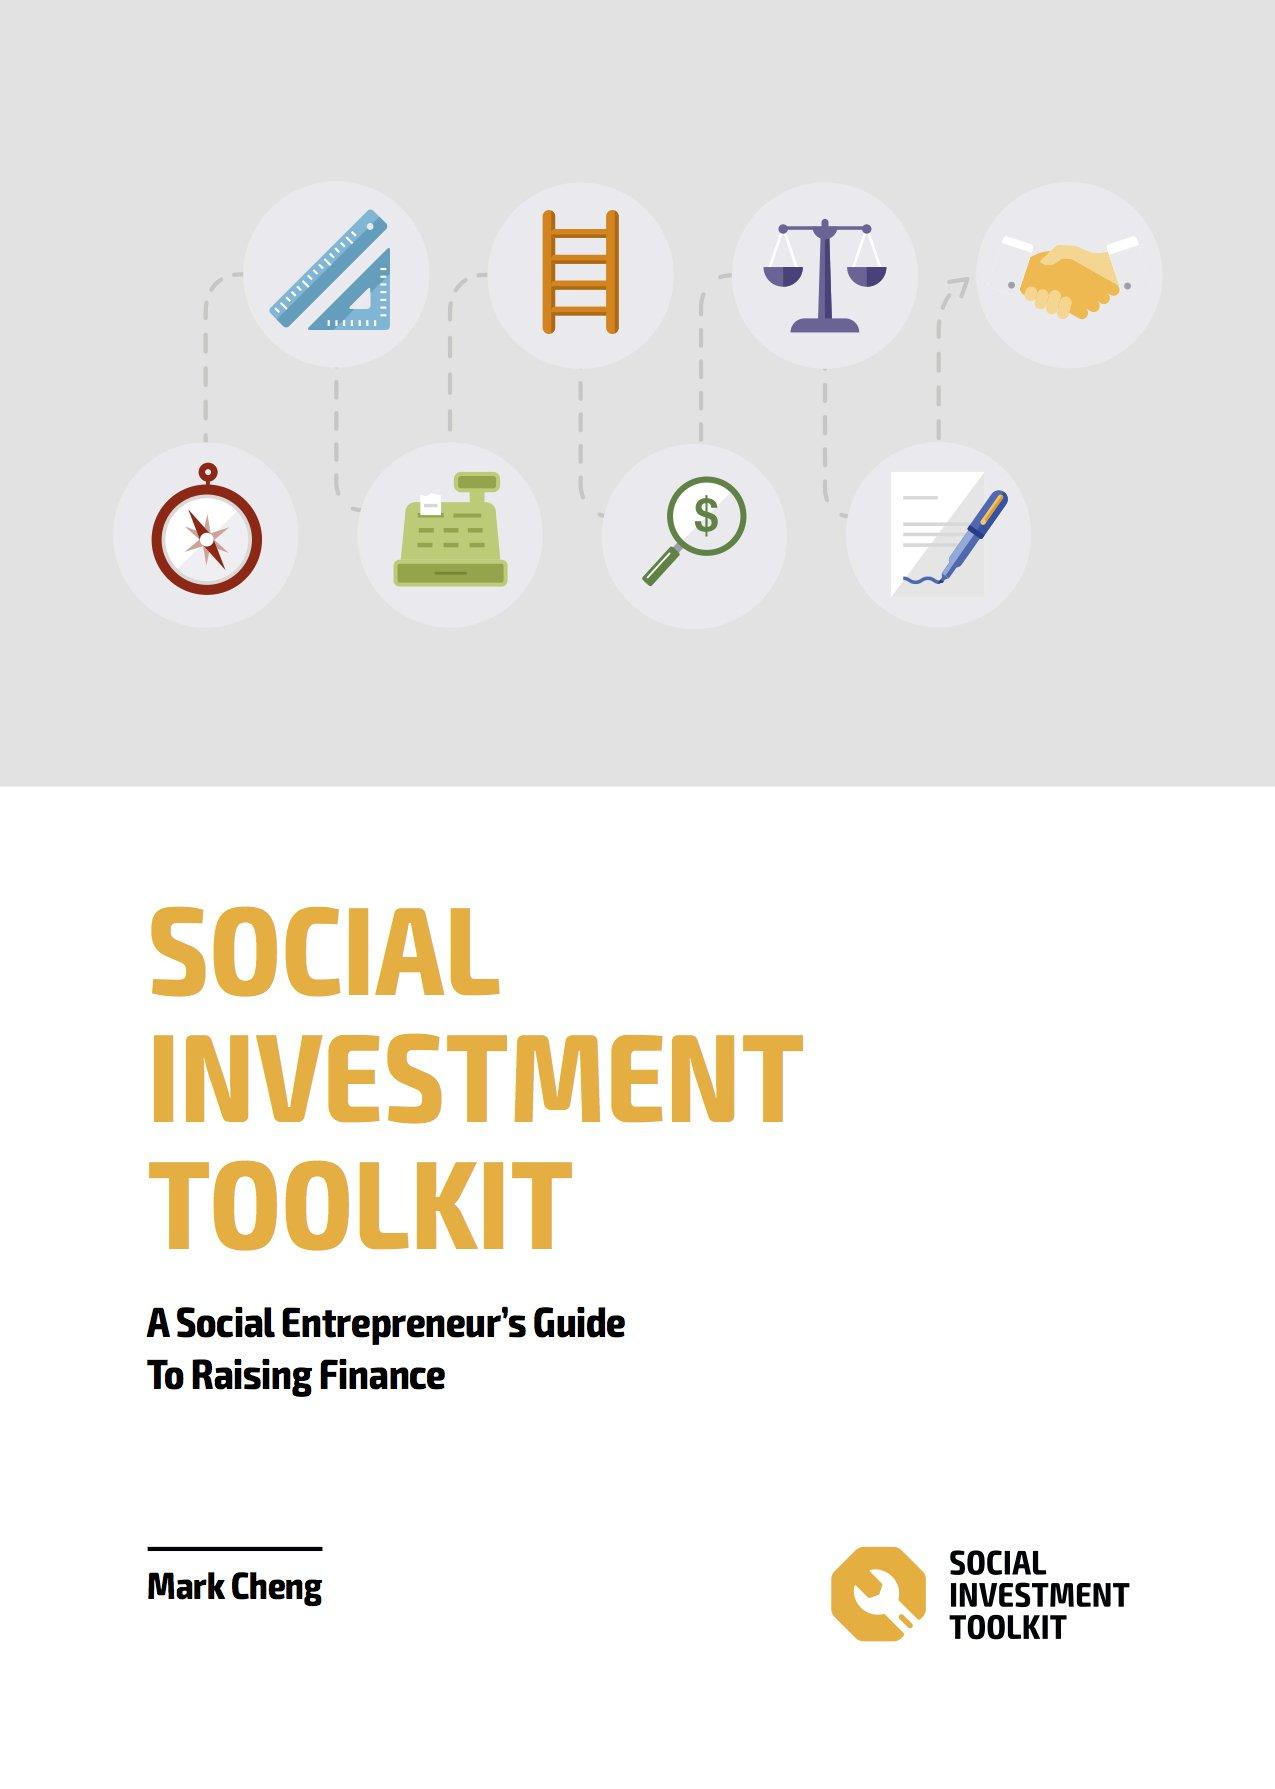 Social Investment Toolkit: A Social Entrepreneur's Guide To Raising Finance